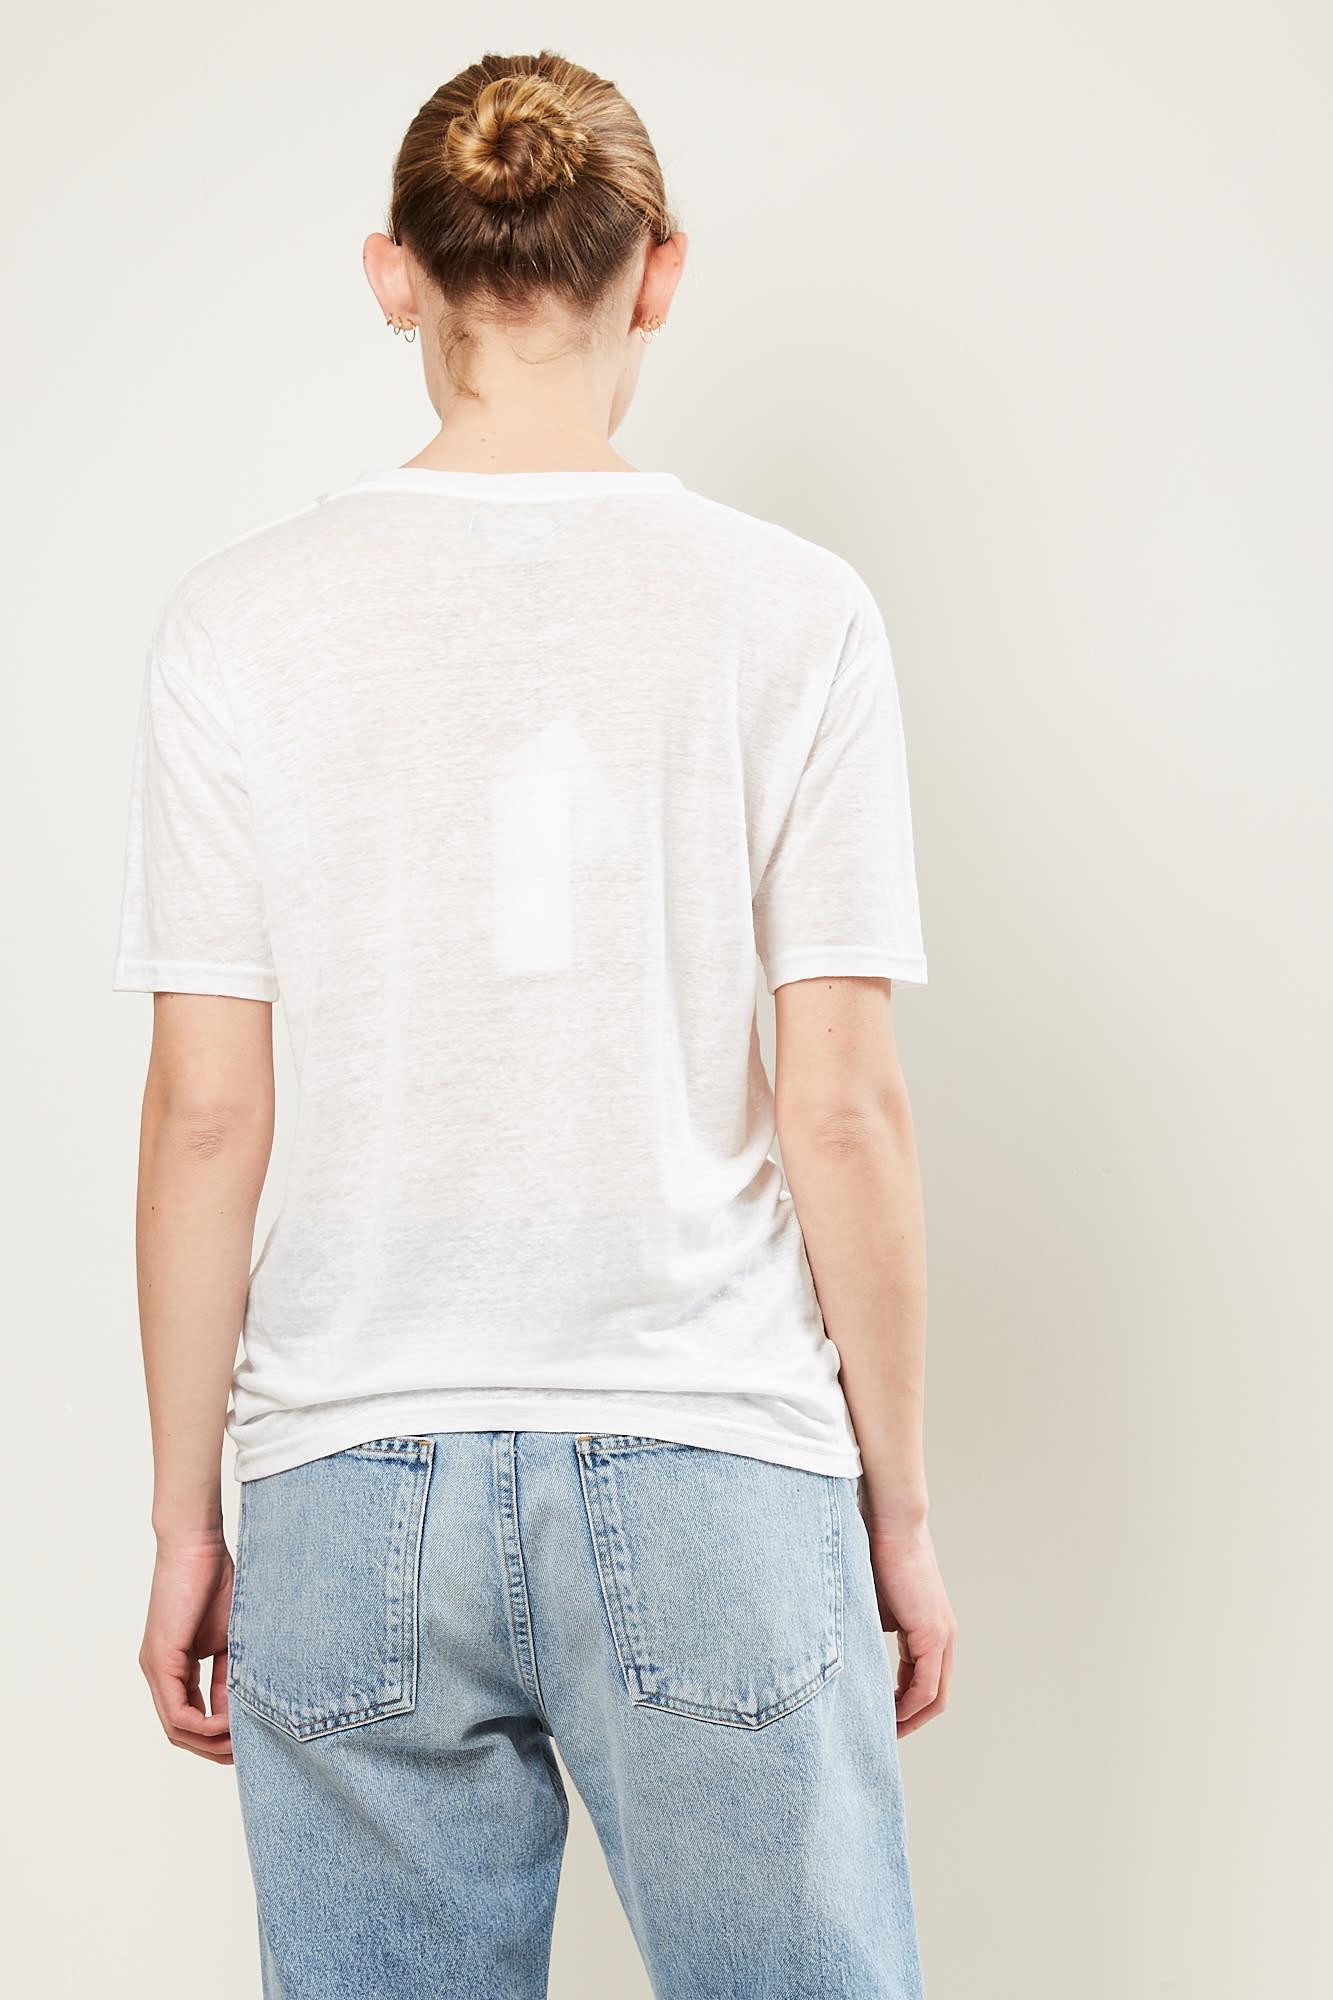 Isabel Marant - madjo tee shirt white